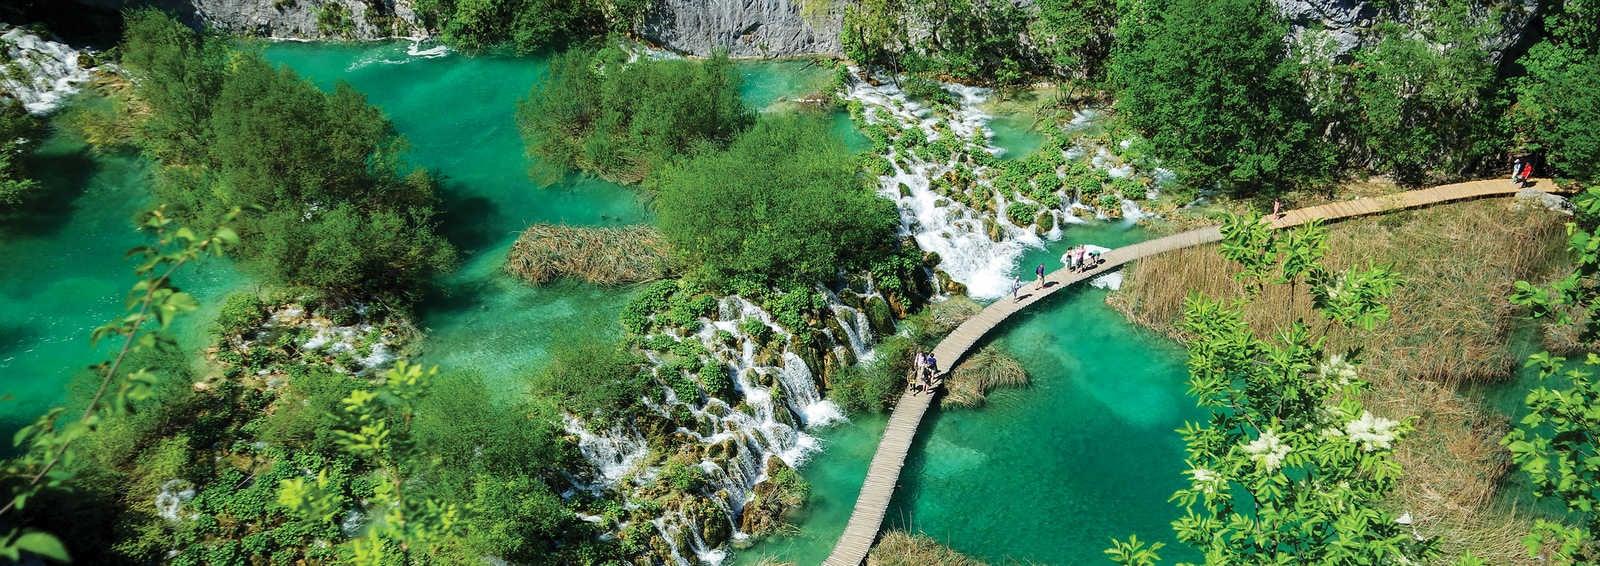 Waterfalls and walking trail, Plitvice Lakes National Park, Croatia